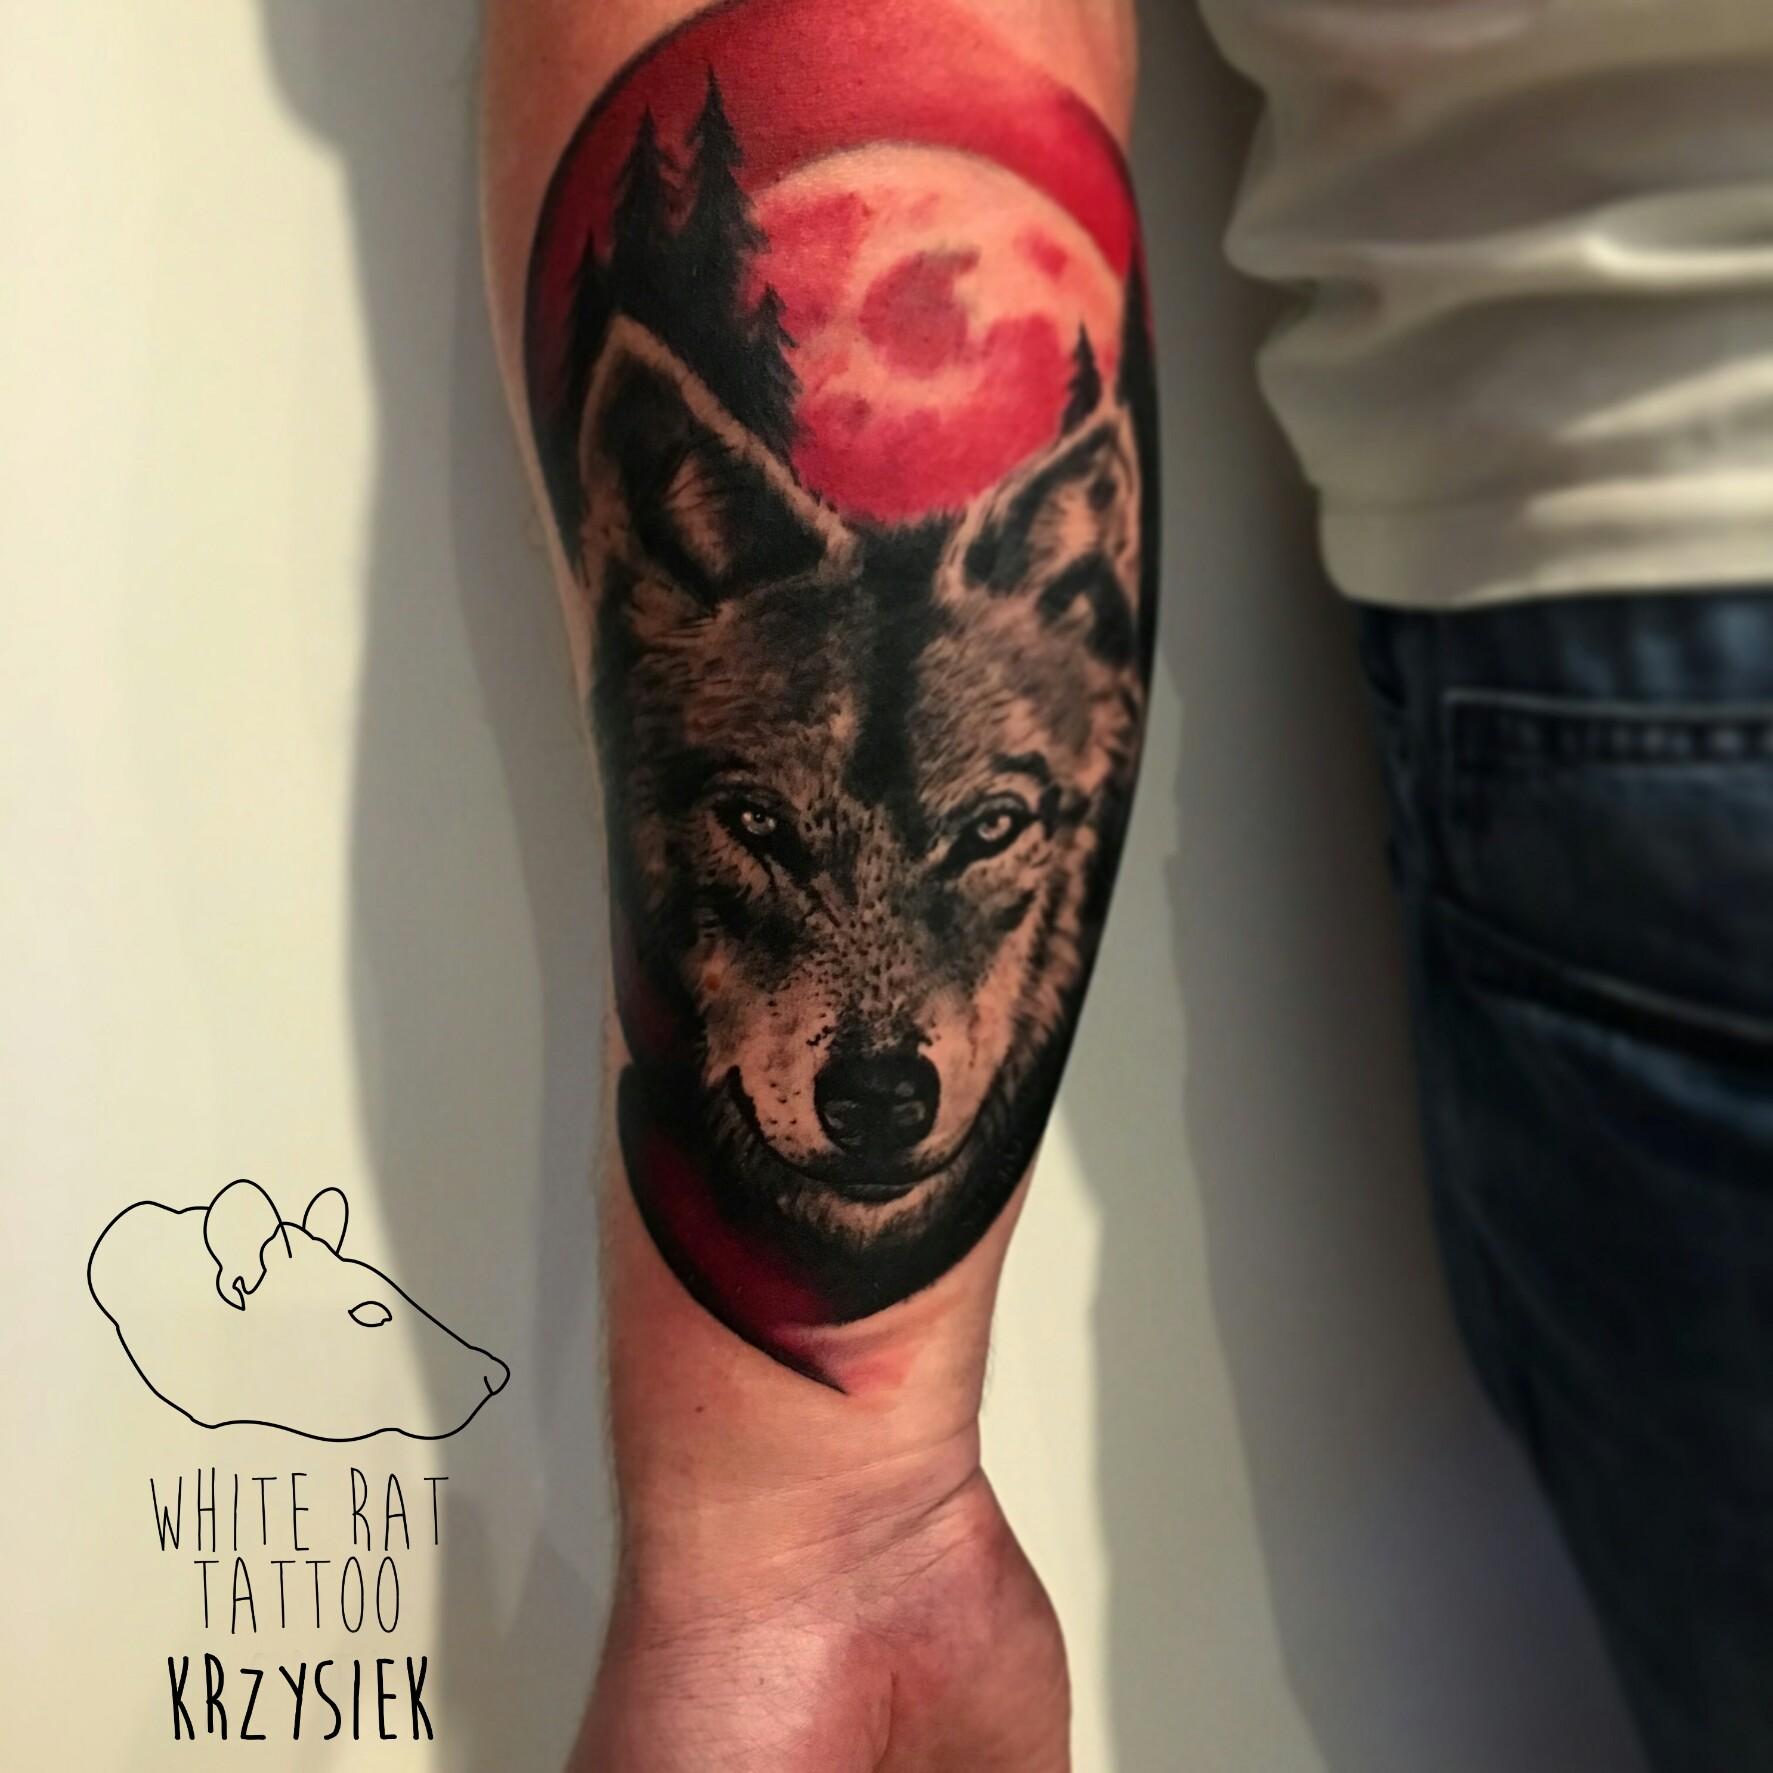 Studio Tatuażu White Rat Tattoo Krzysztof Jakubowski